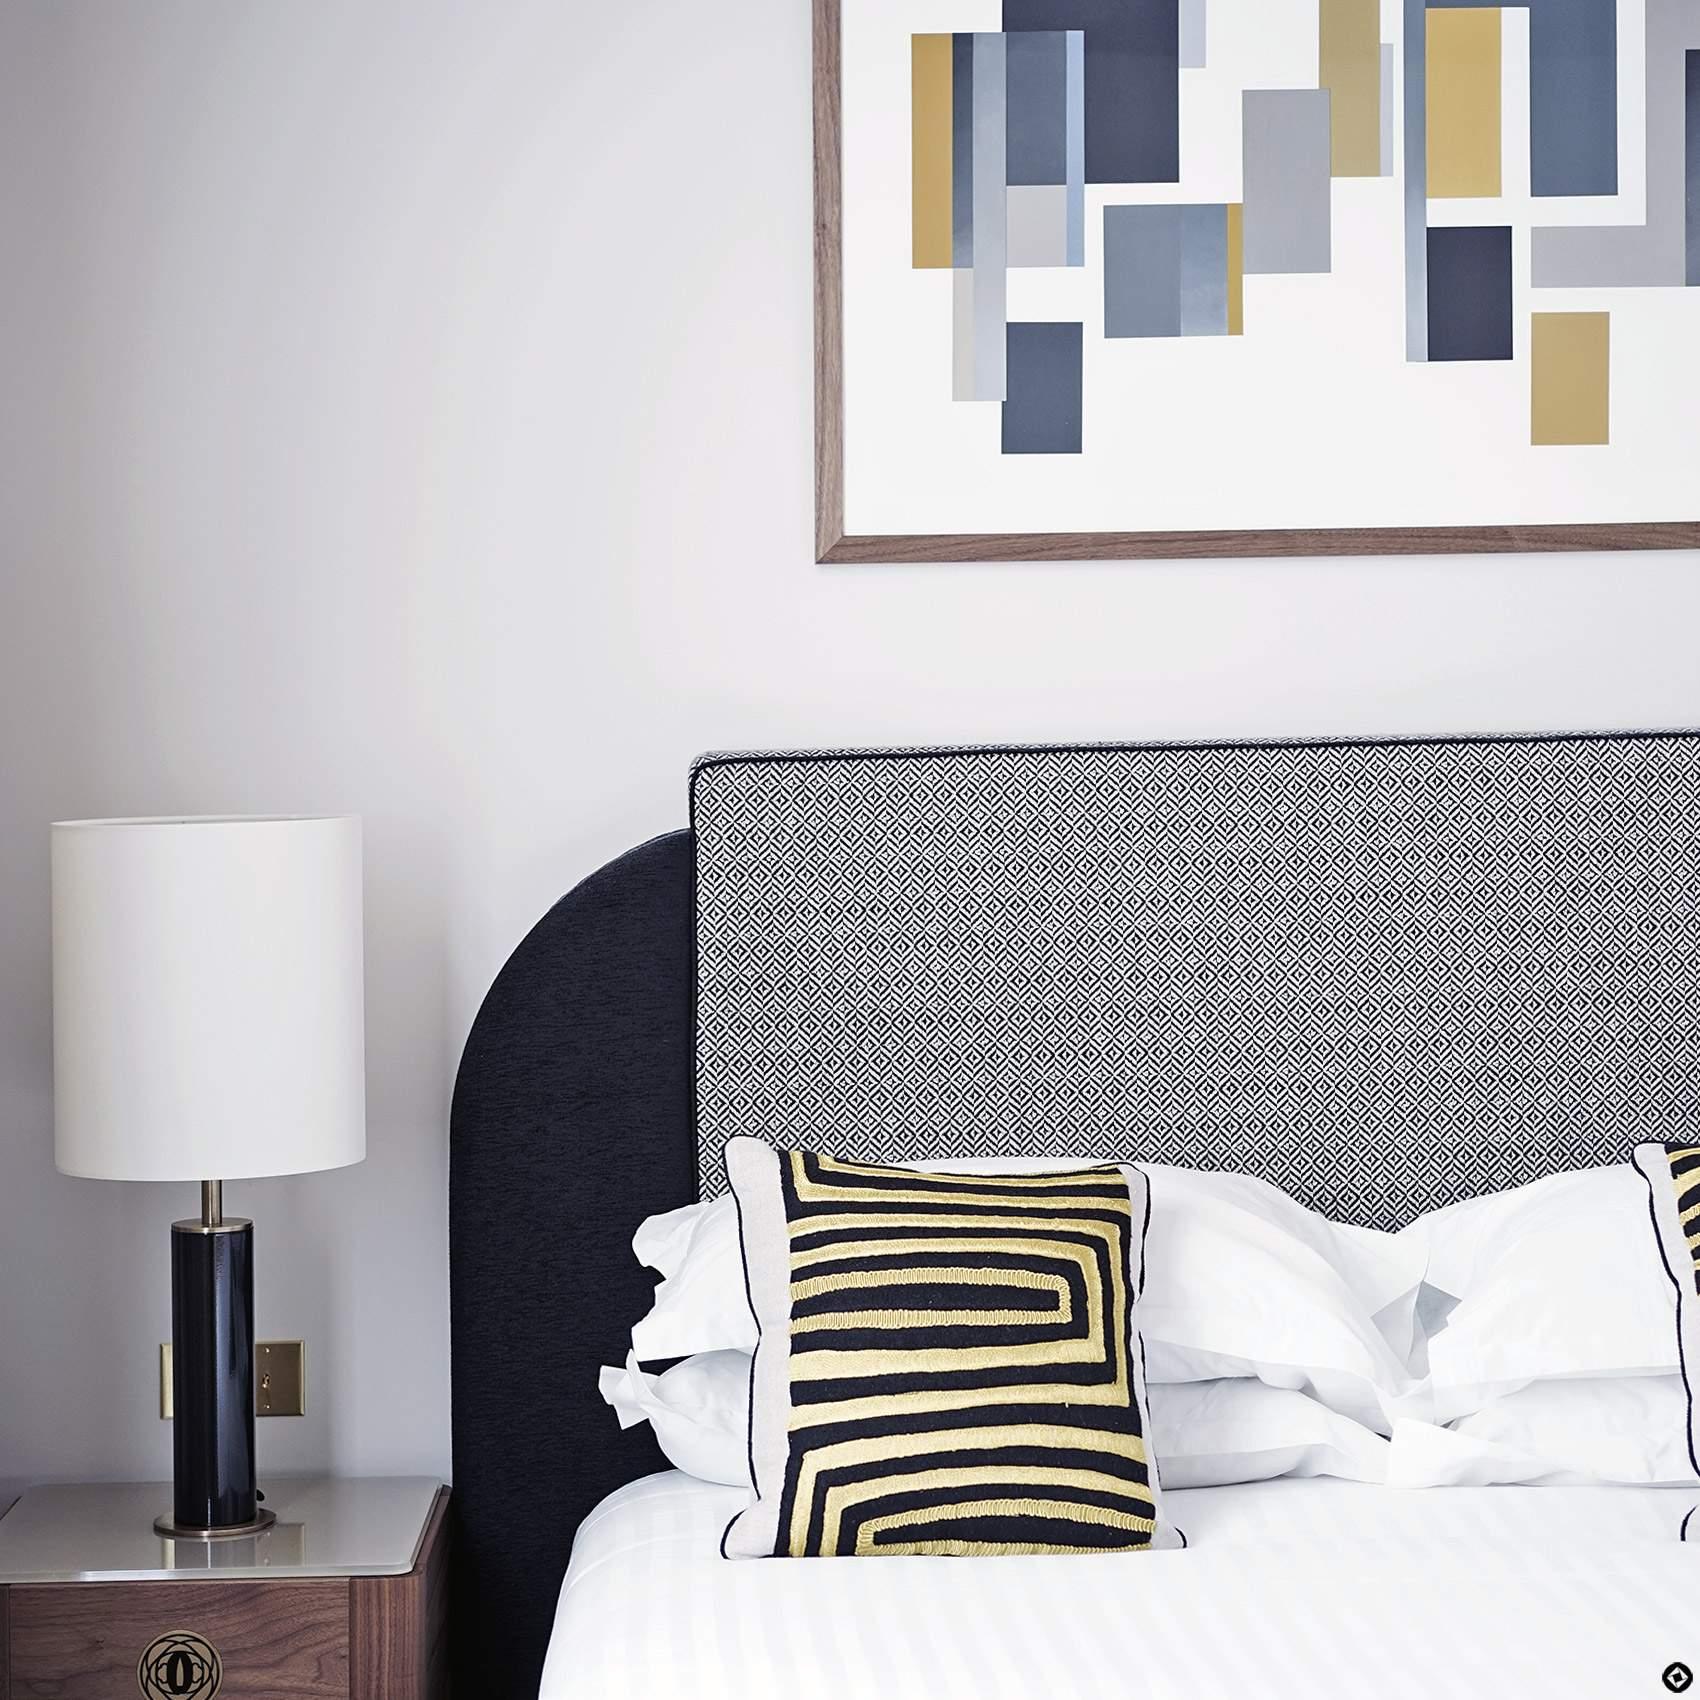 Le tsuba hotel paris blog design jo yana for Hotel design paris 8